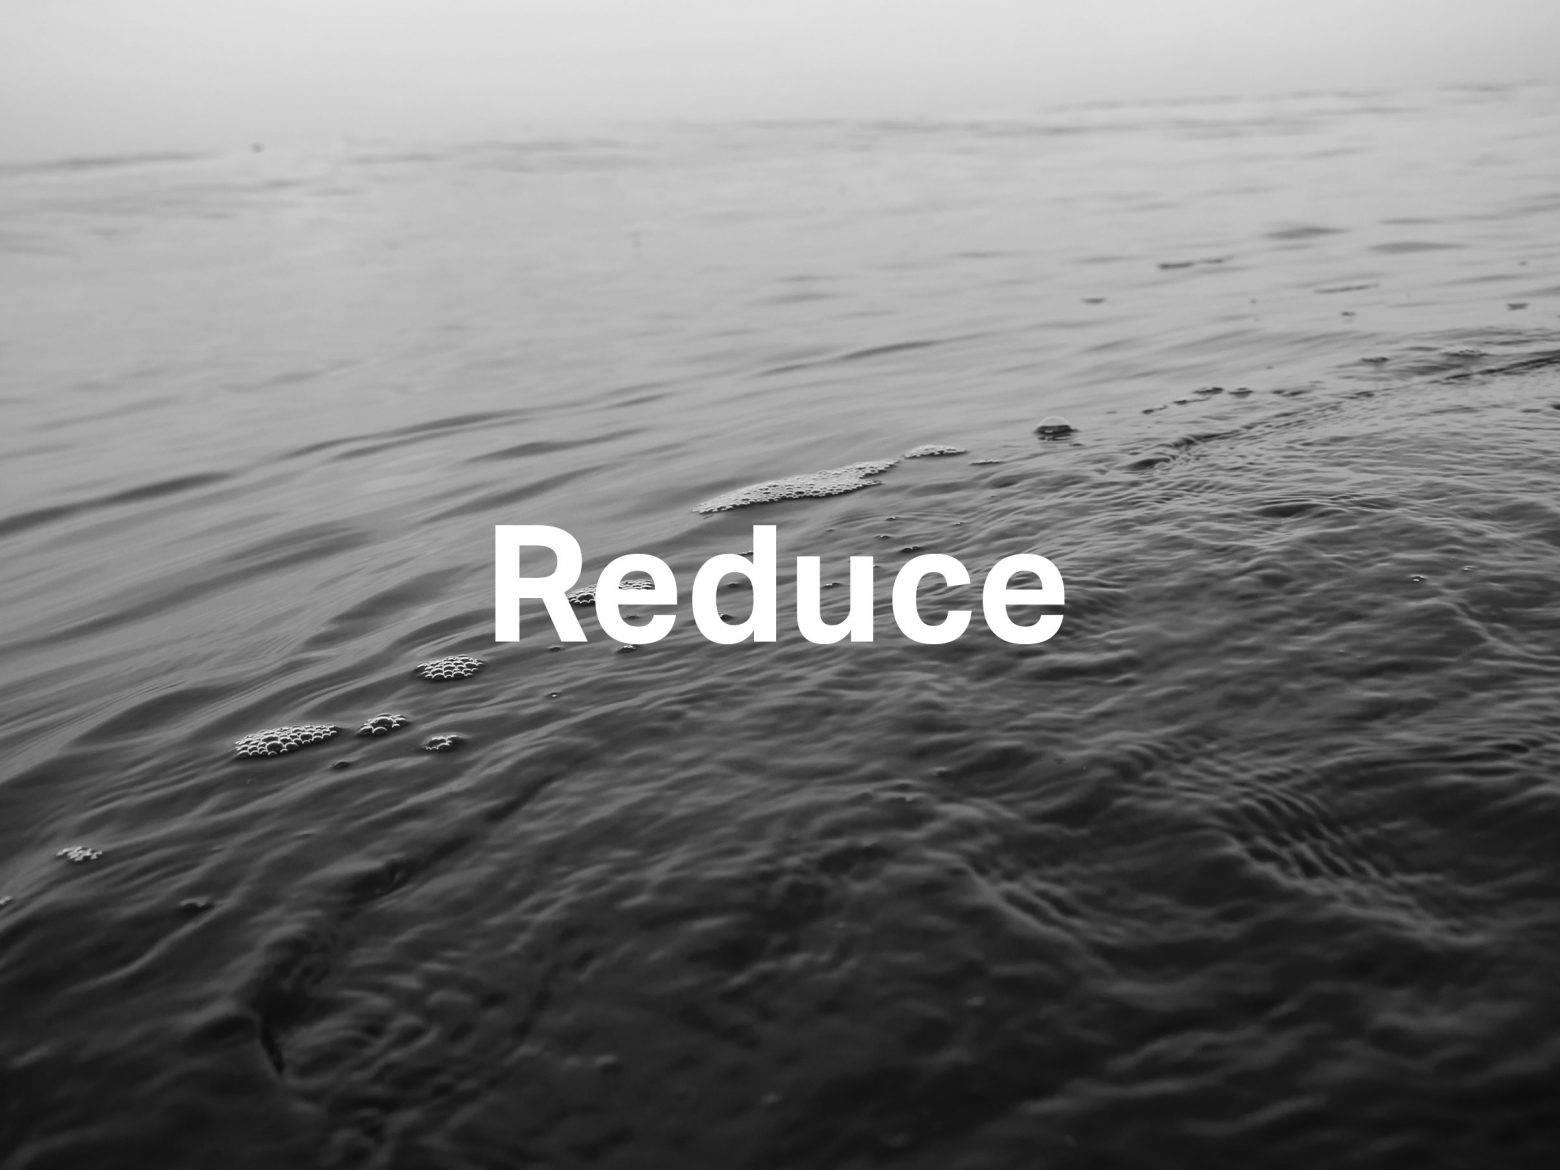 https://www.soulandsurf.com/wp-content/uploads/2021/08/climate-action-plan-S_S-Reduce-e1628350132441.jpg Image